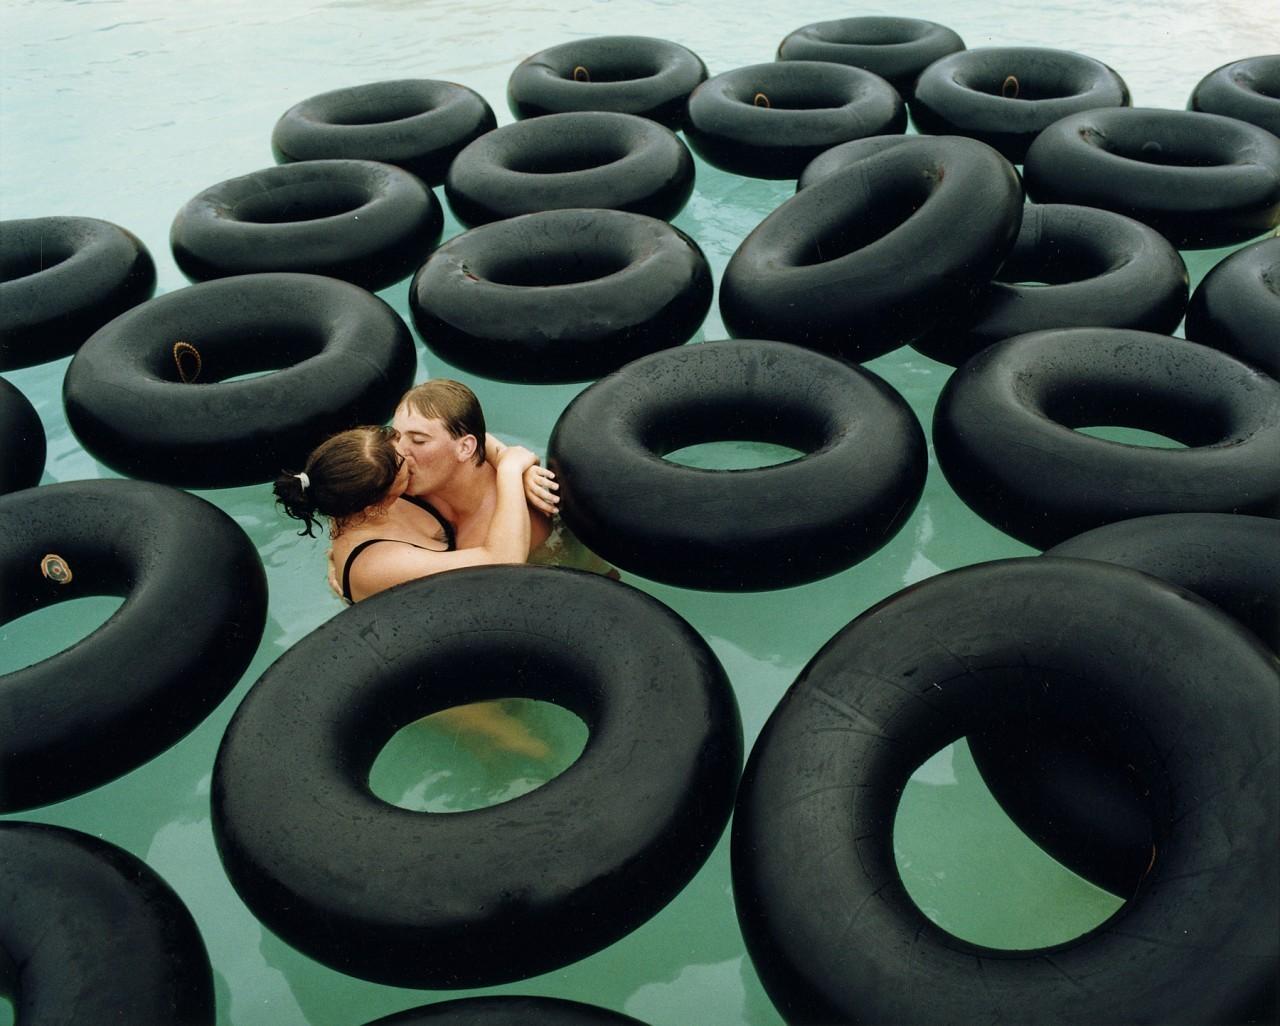 Из серии «Skara Sommarland», 1989. Фотограф Ларс Тунбьёрк